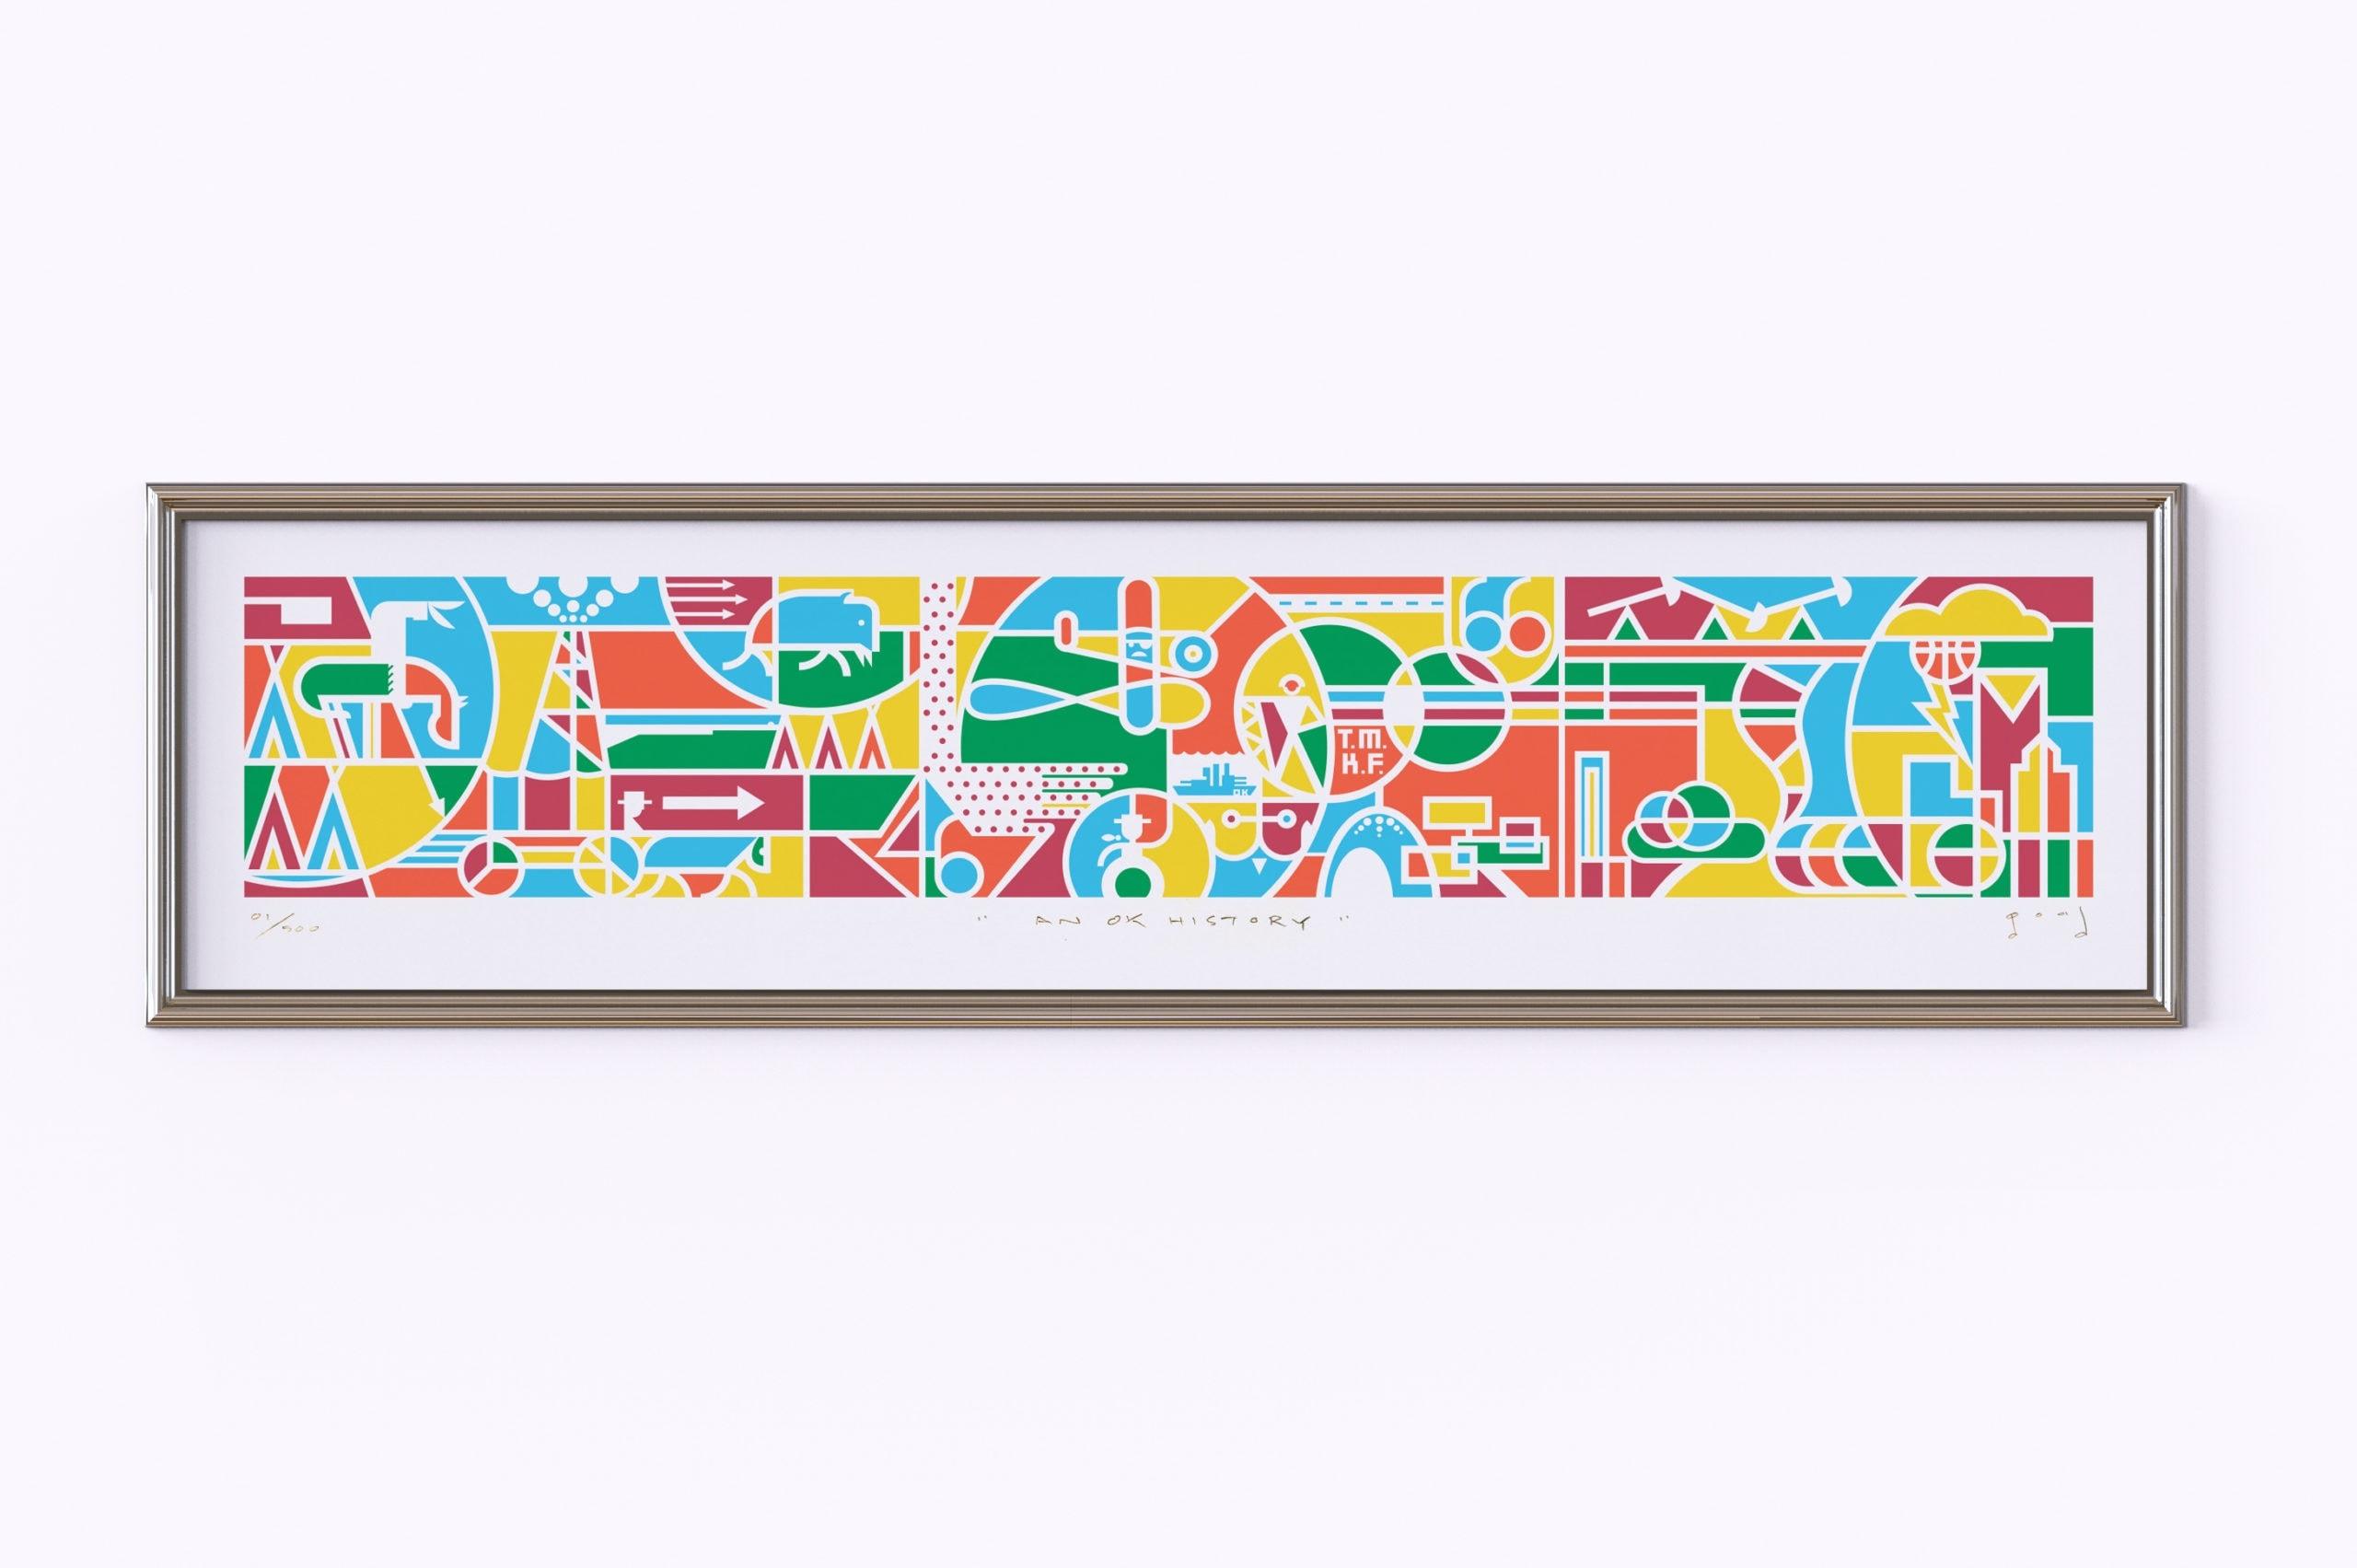 AN OK History Print Framed scaled, Matt Goad